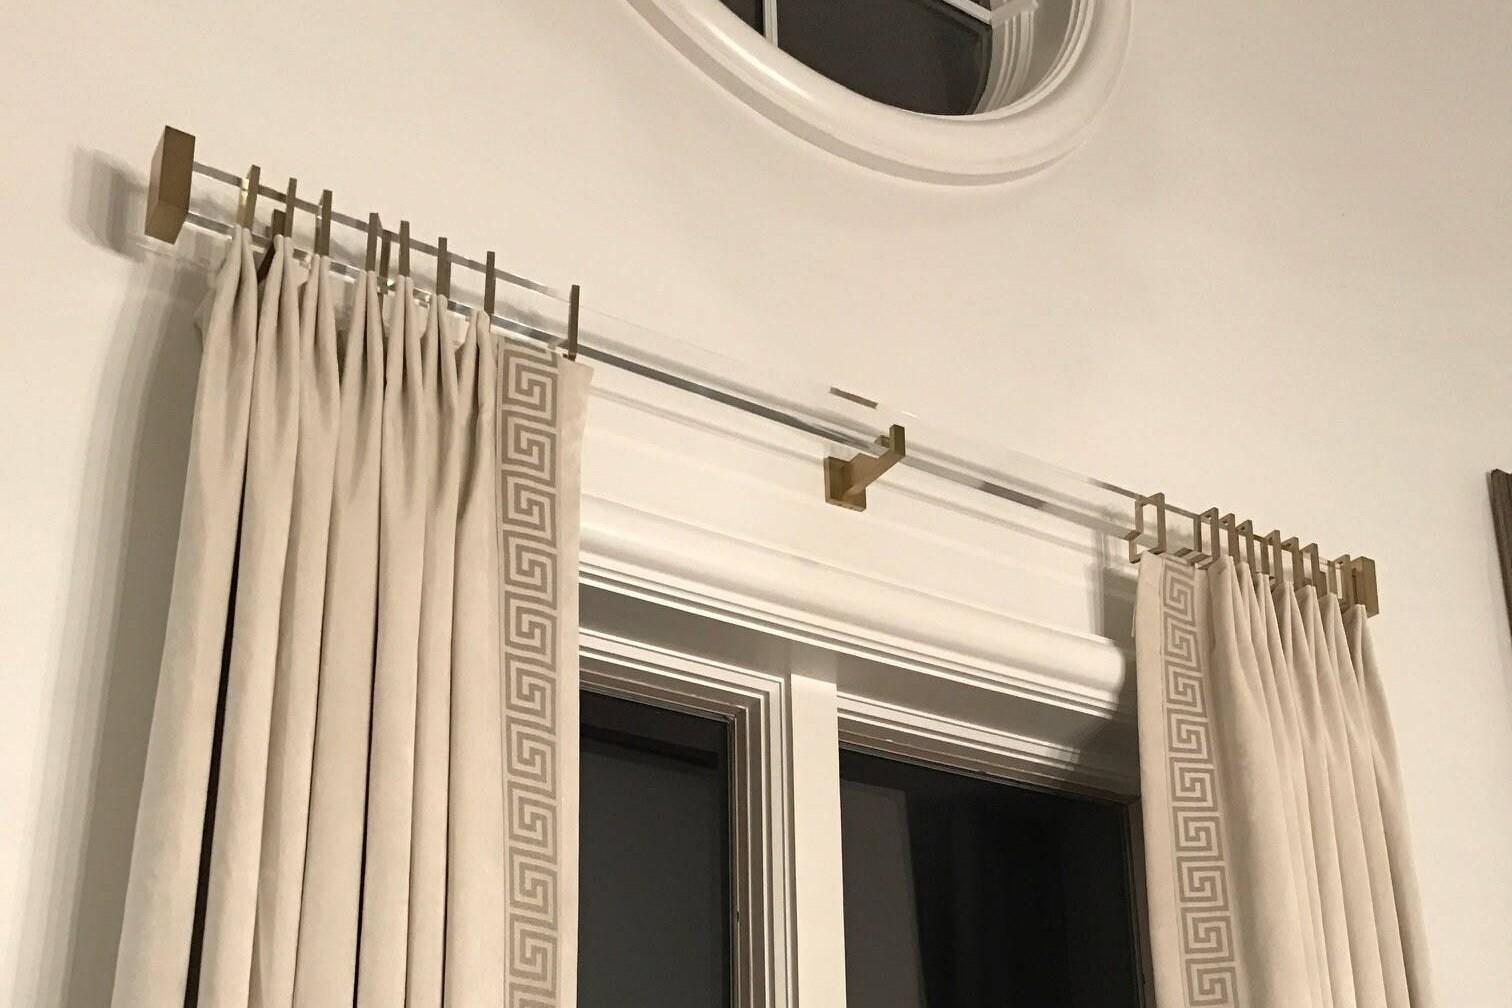 Rectangle Acrylic Metal Bracket For Rectangle Lucite Or Acrylic Drapery Rod Rectangular Curtain Rod